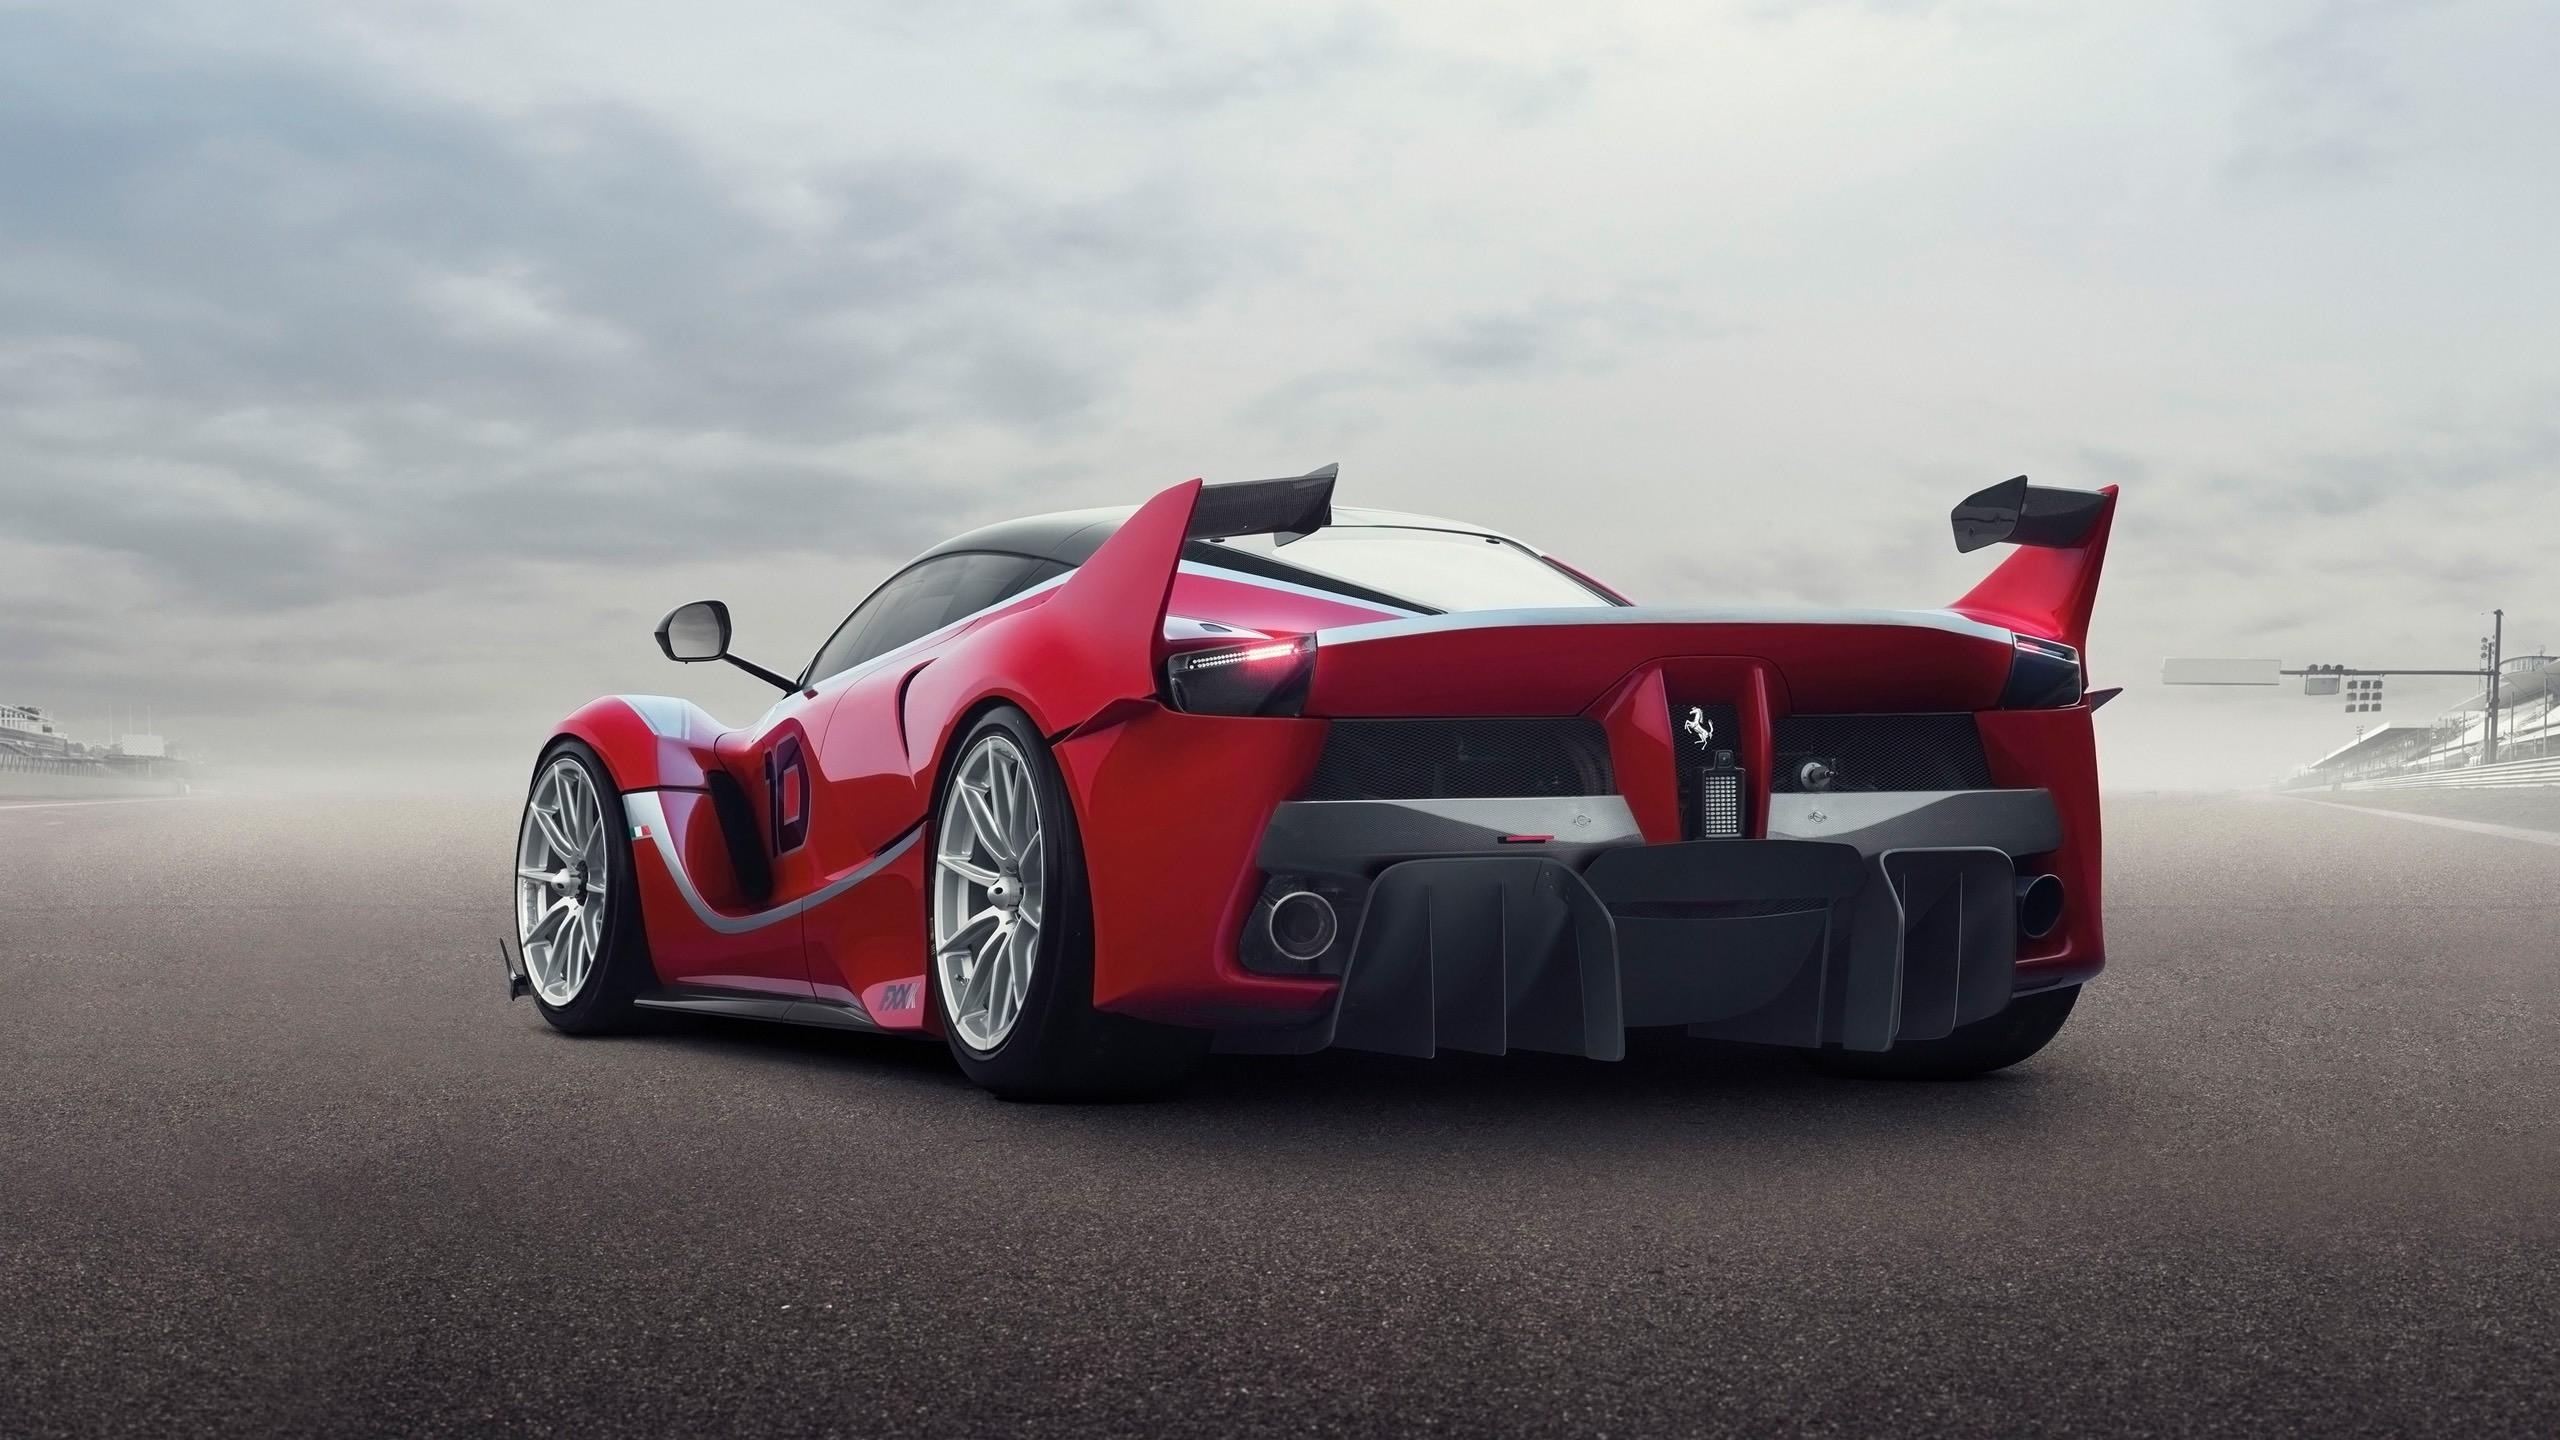 Delightful Car Wings Vehicle Rear View Sports Car Ferrari Performance Car Hypercar  Ferrari FXX K Supercar Land